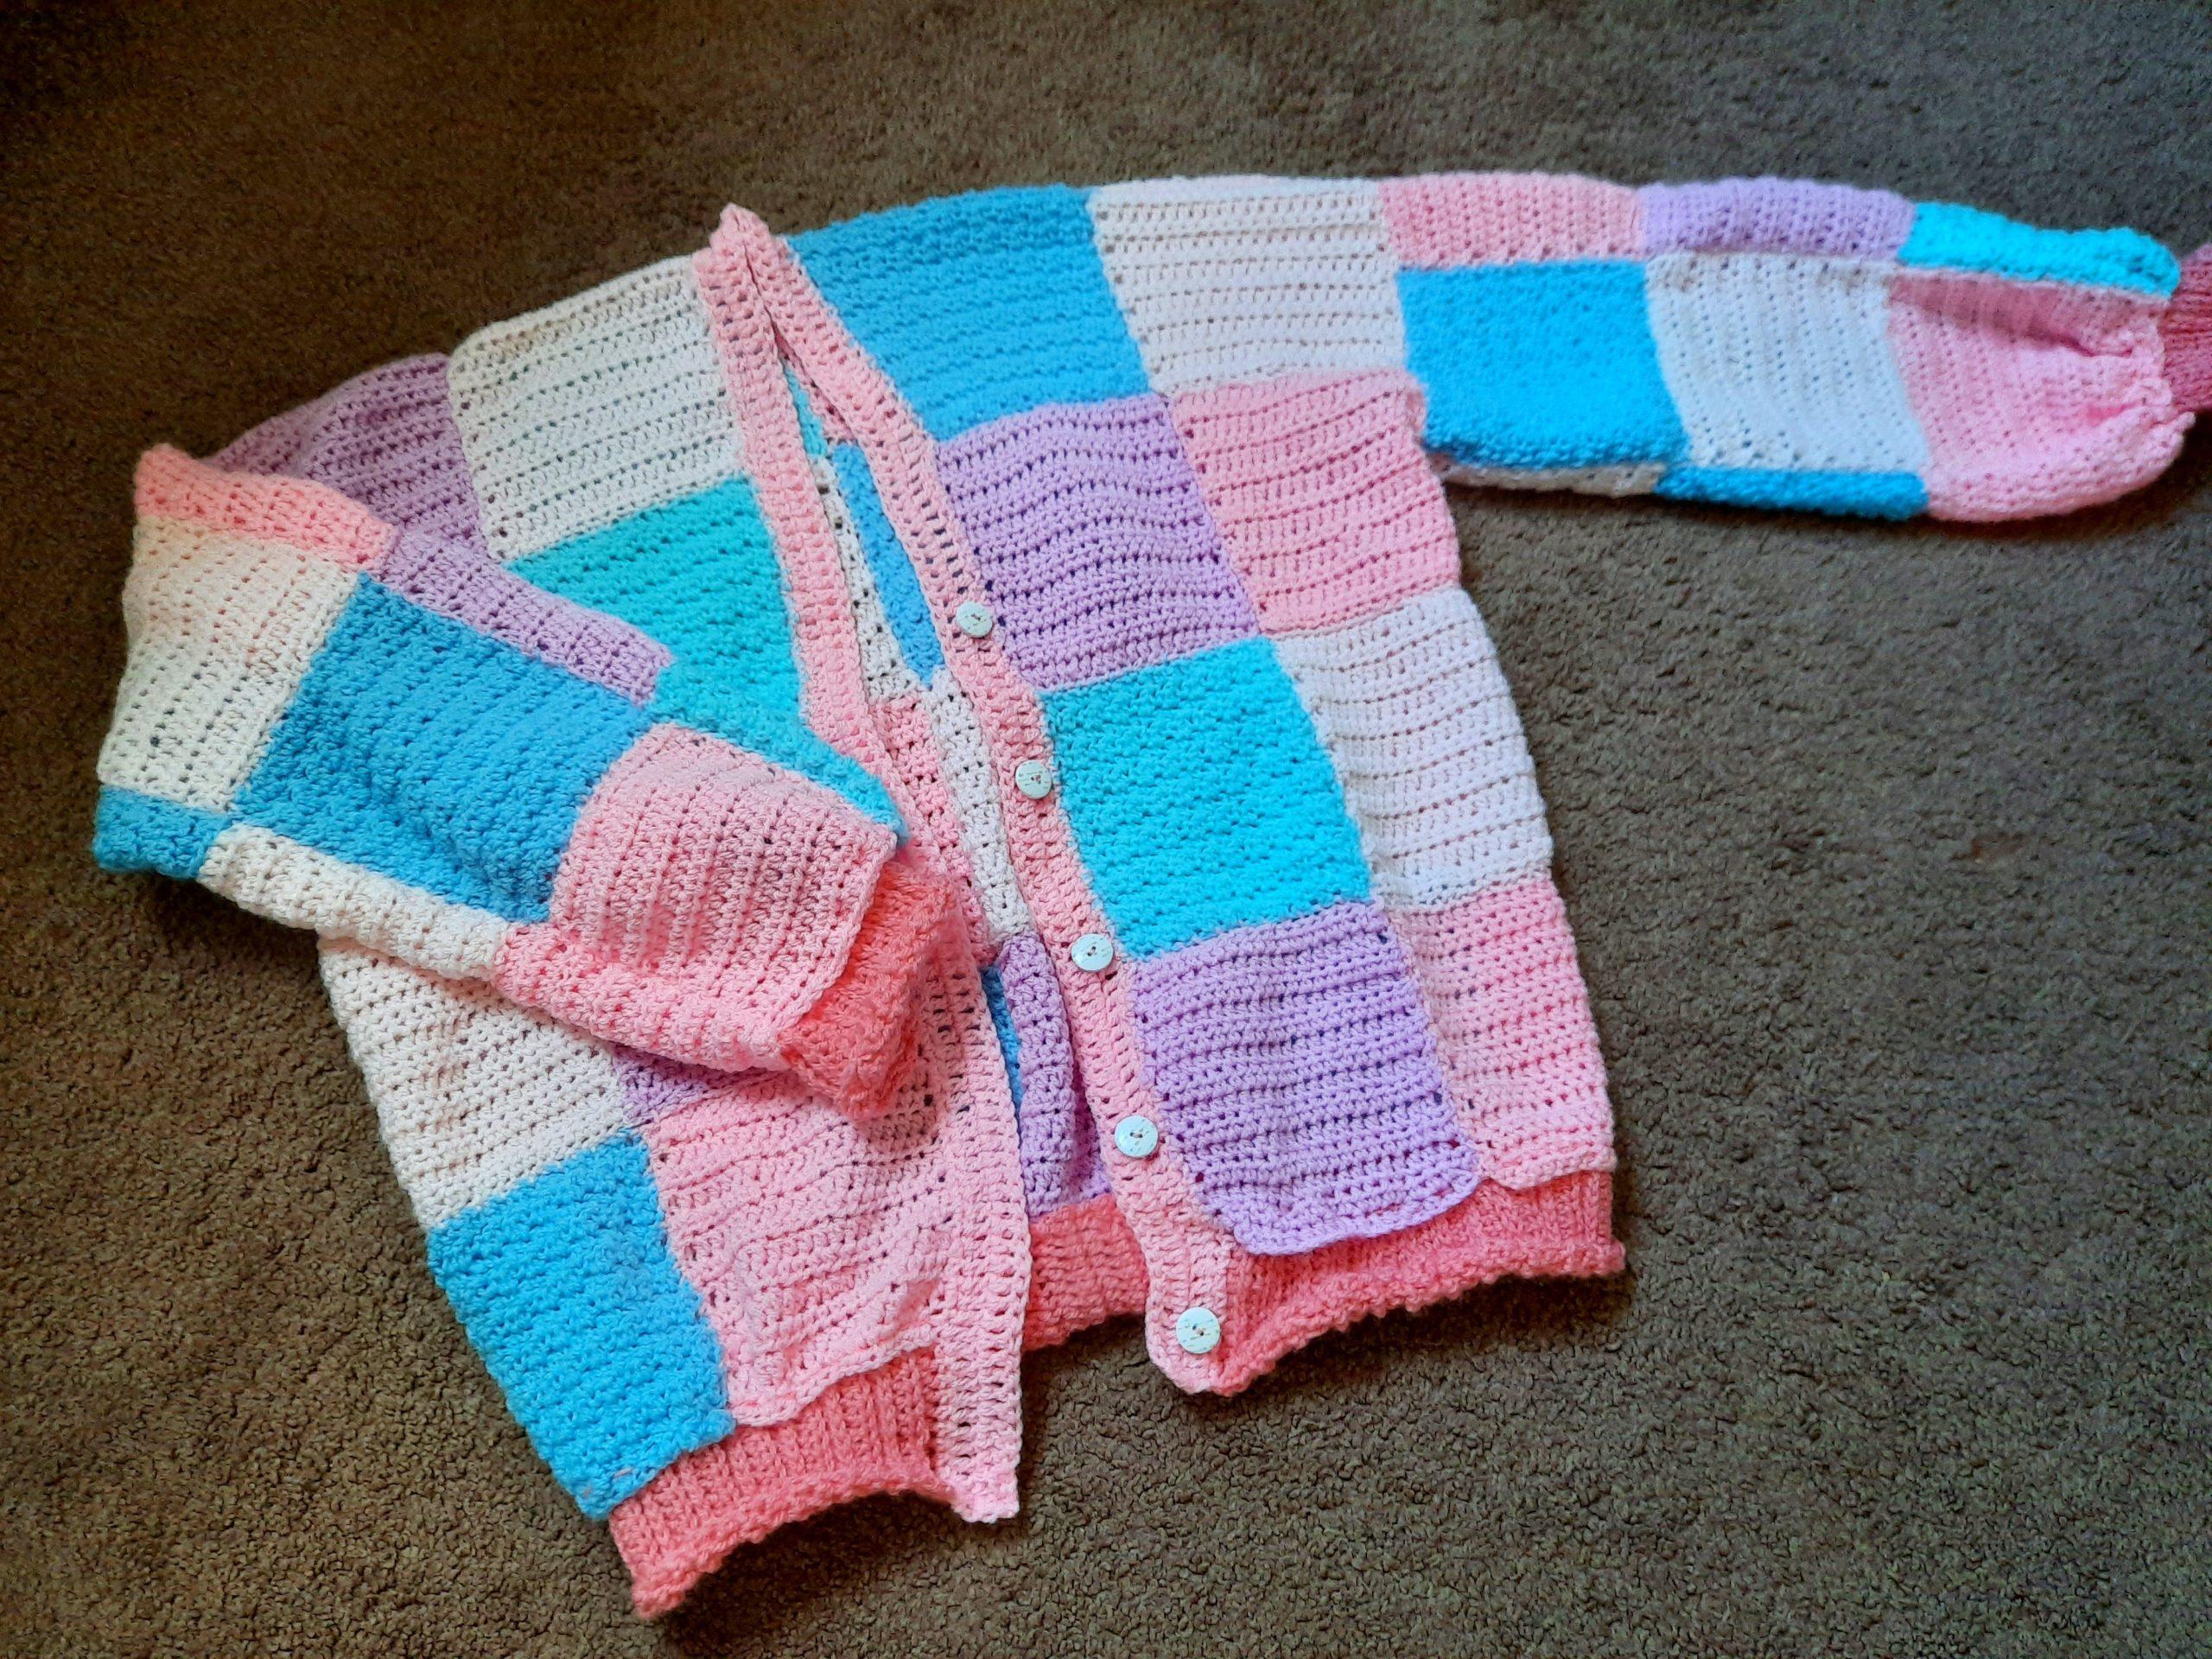 Crochet JW Anderson Inspired Pastel Patchwork Cardigan